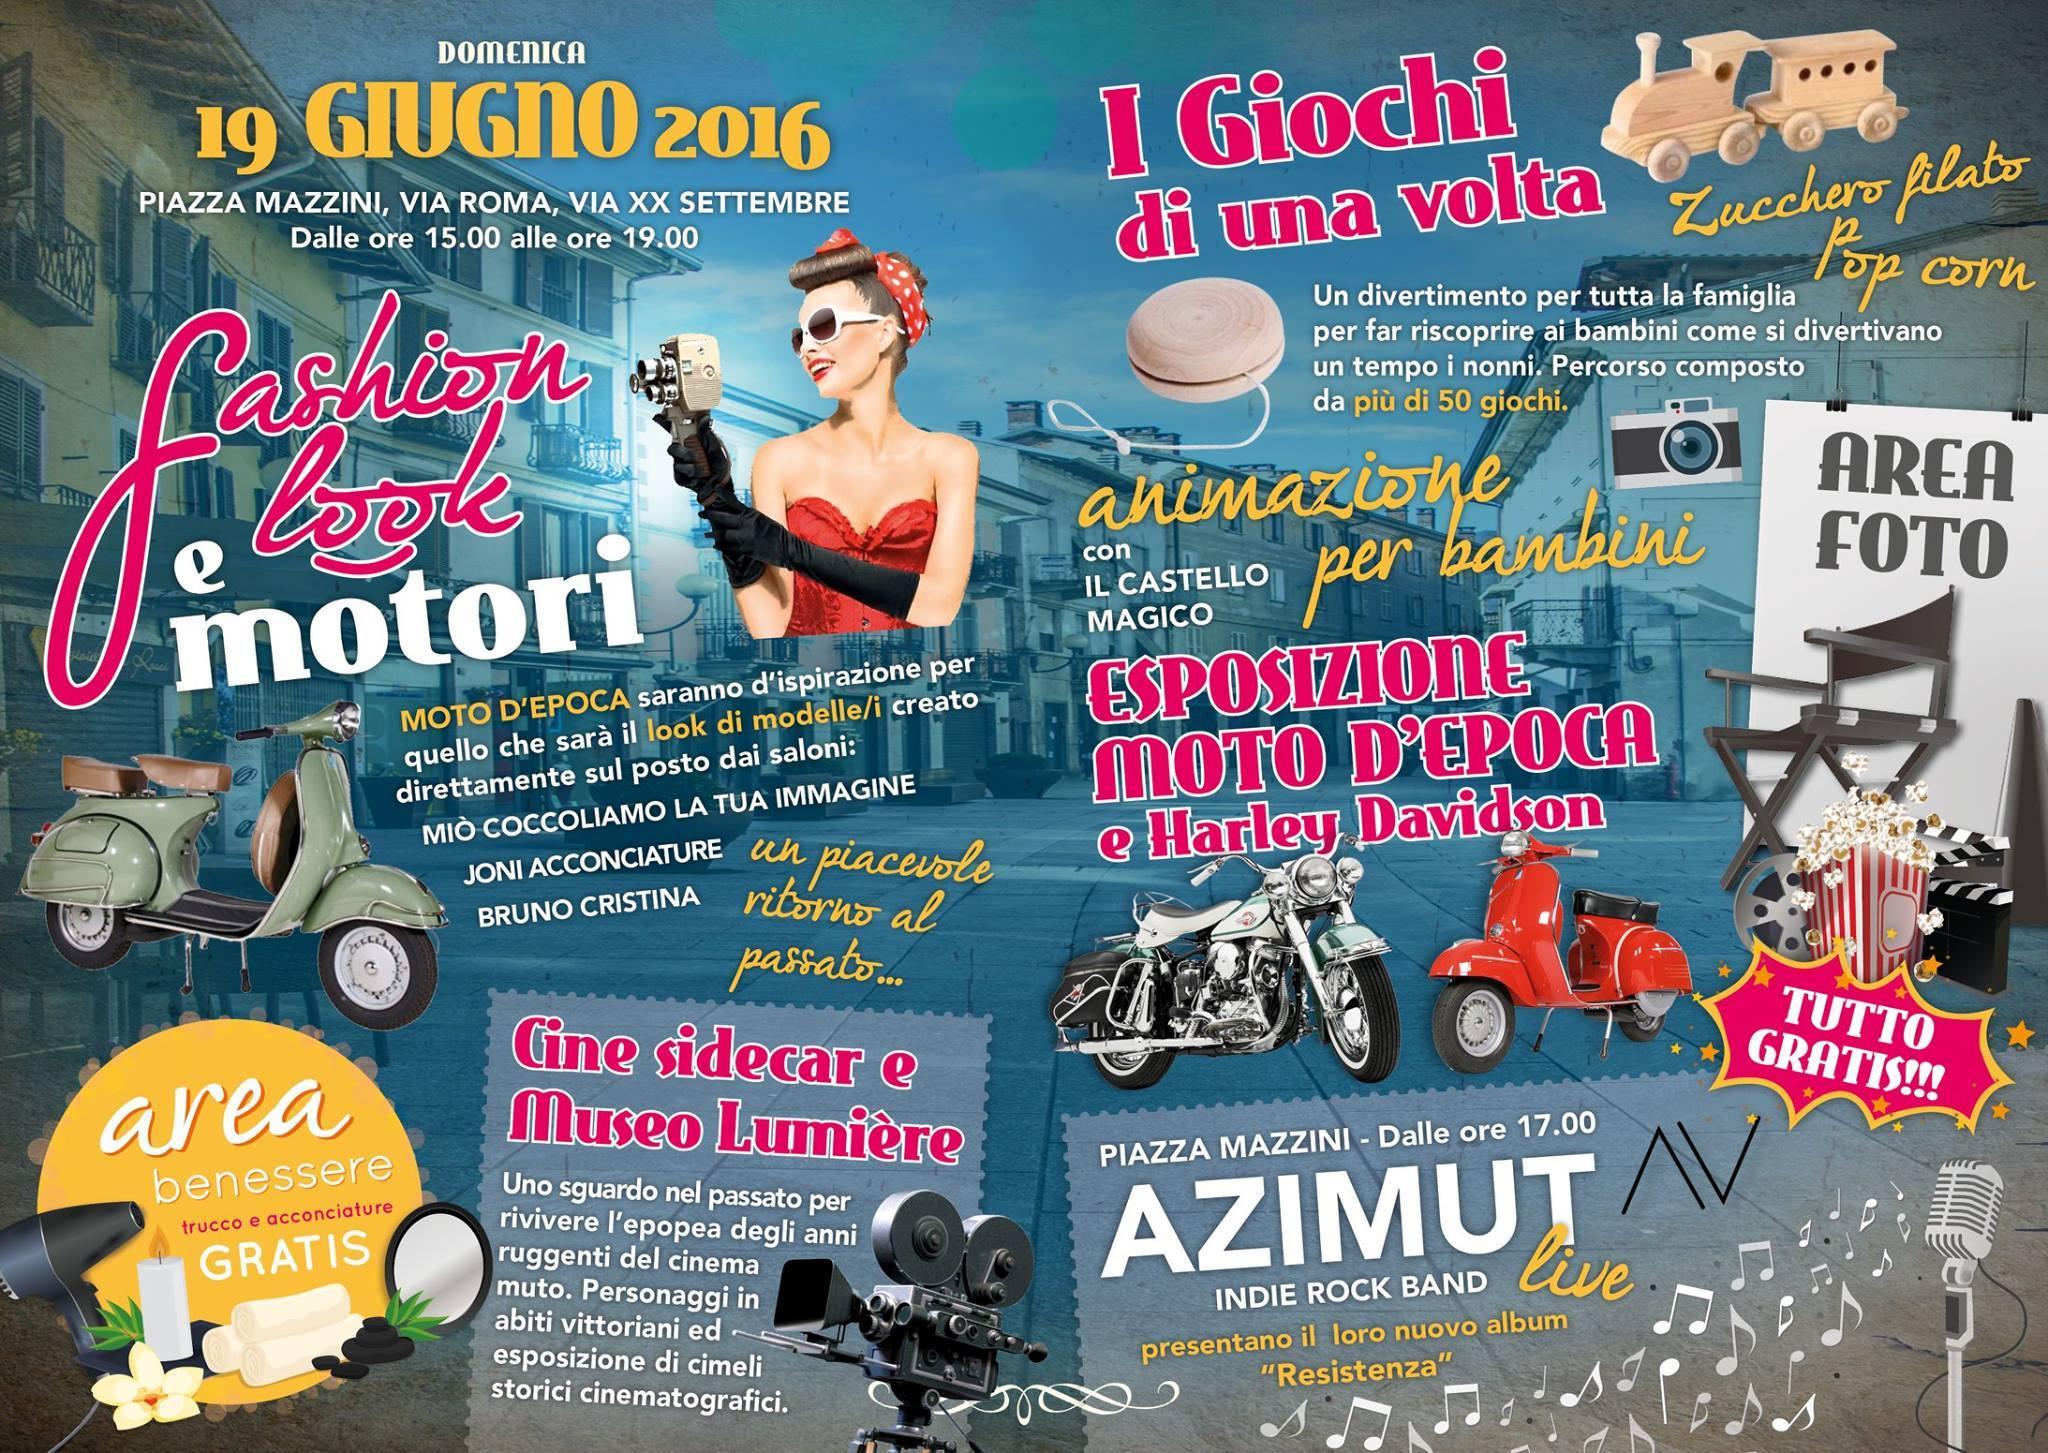 programma_fashionlook_motori